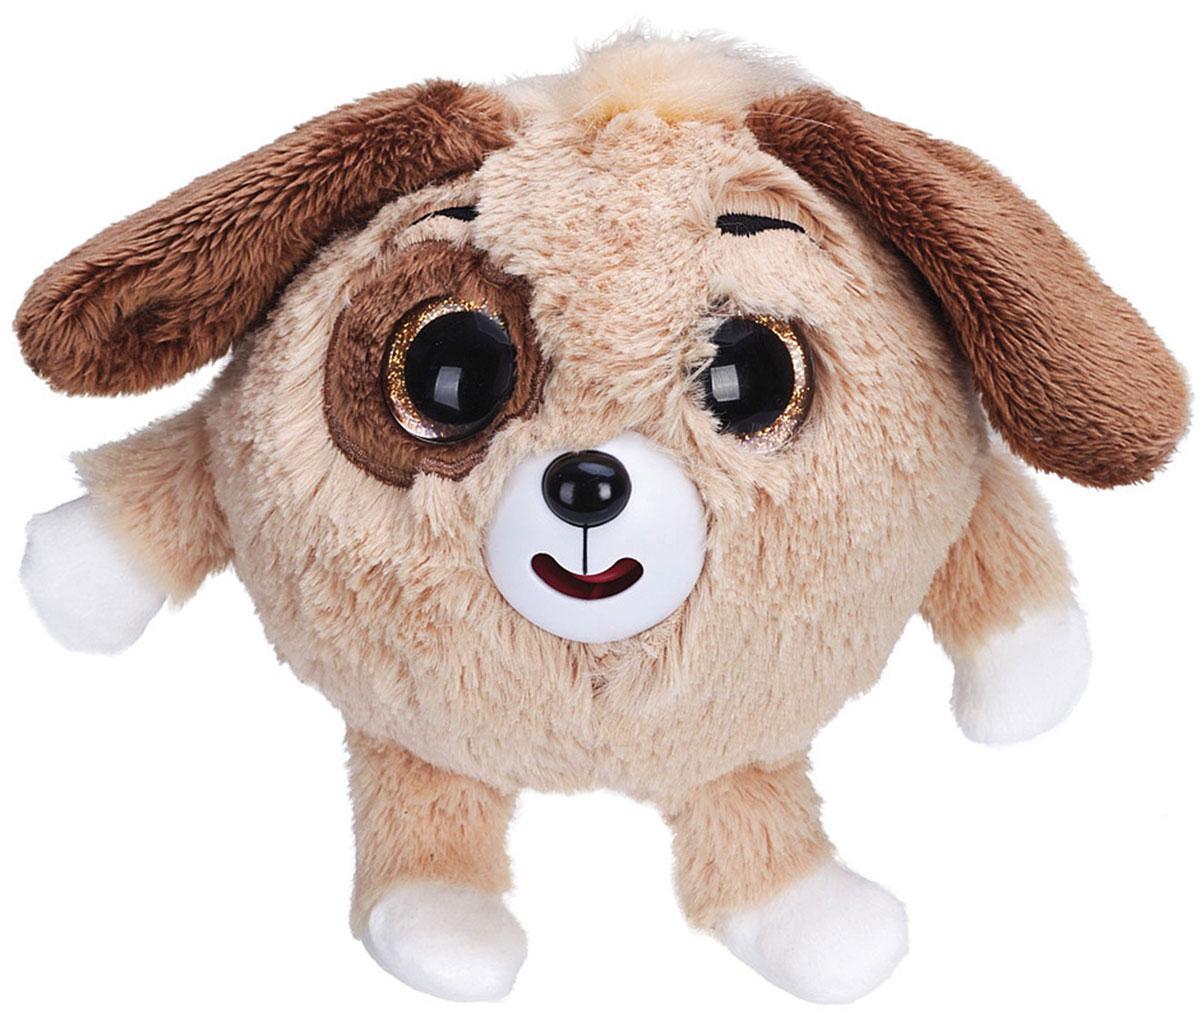 1TOY Мягкая озвученная игрушка Дразнюка-Zooка Собачка цвет коричневый 13 см 1toyмягкая озвученная игрушка дразнюка zoo лисичка 13 см